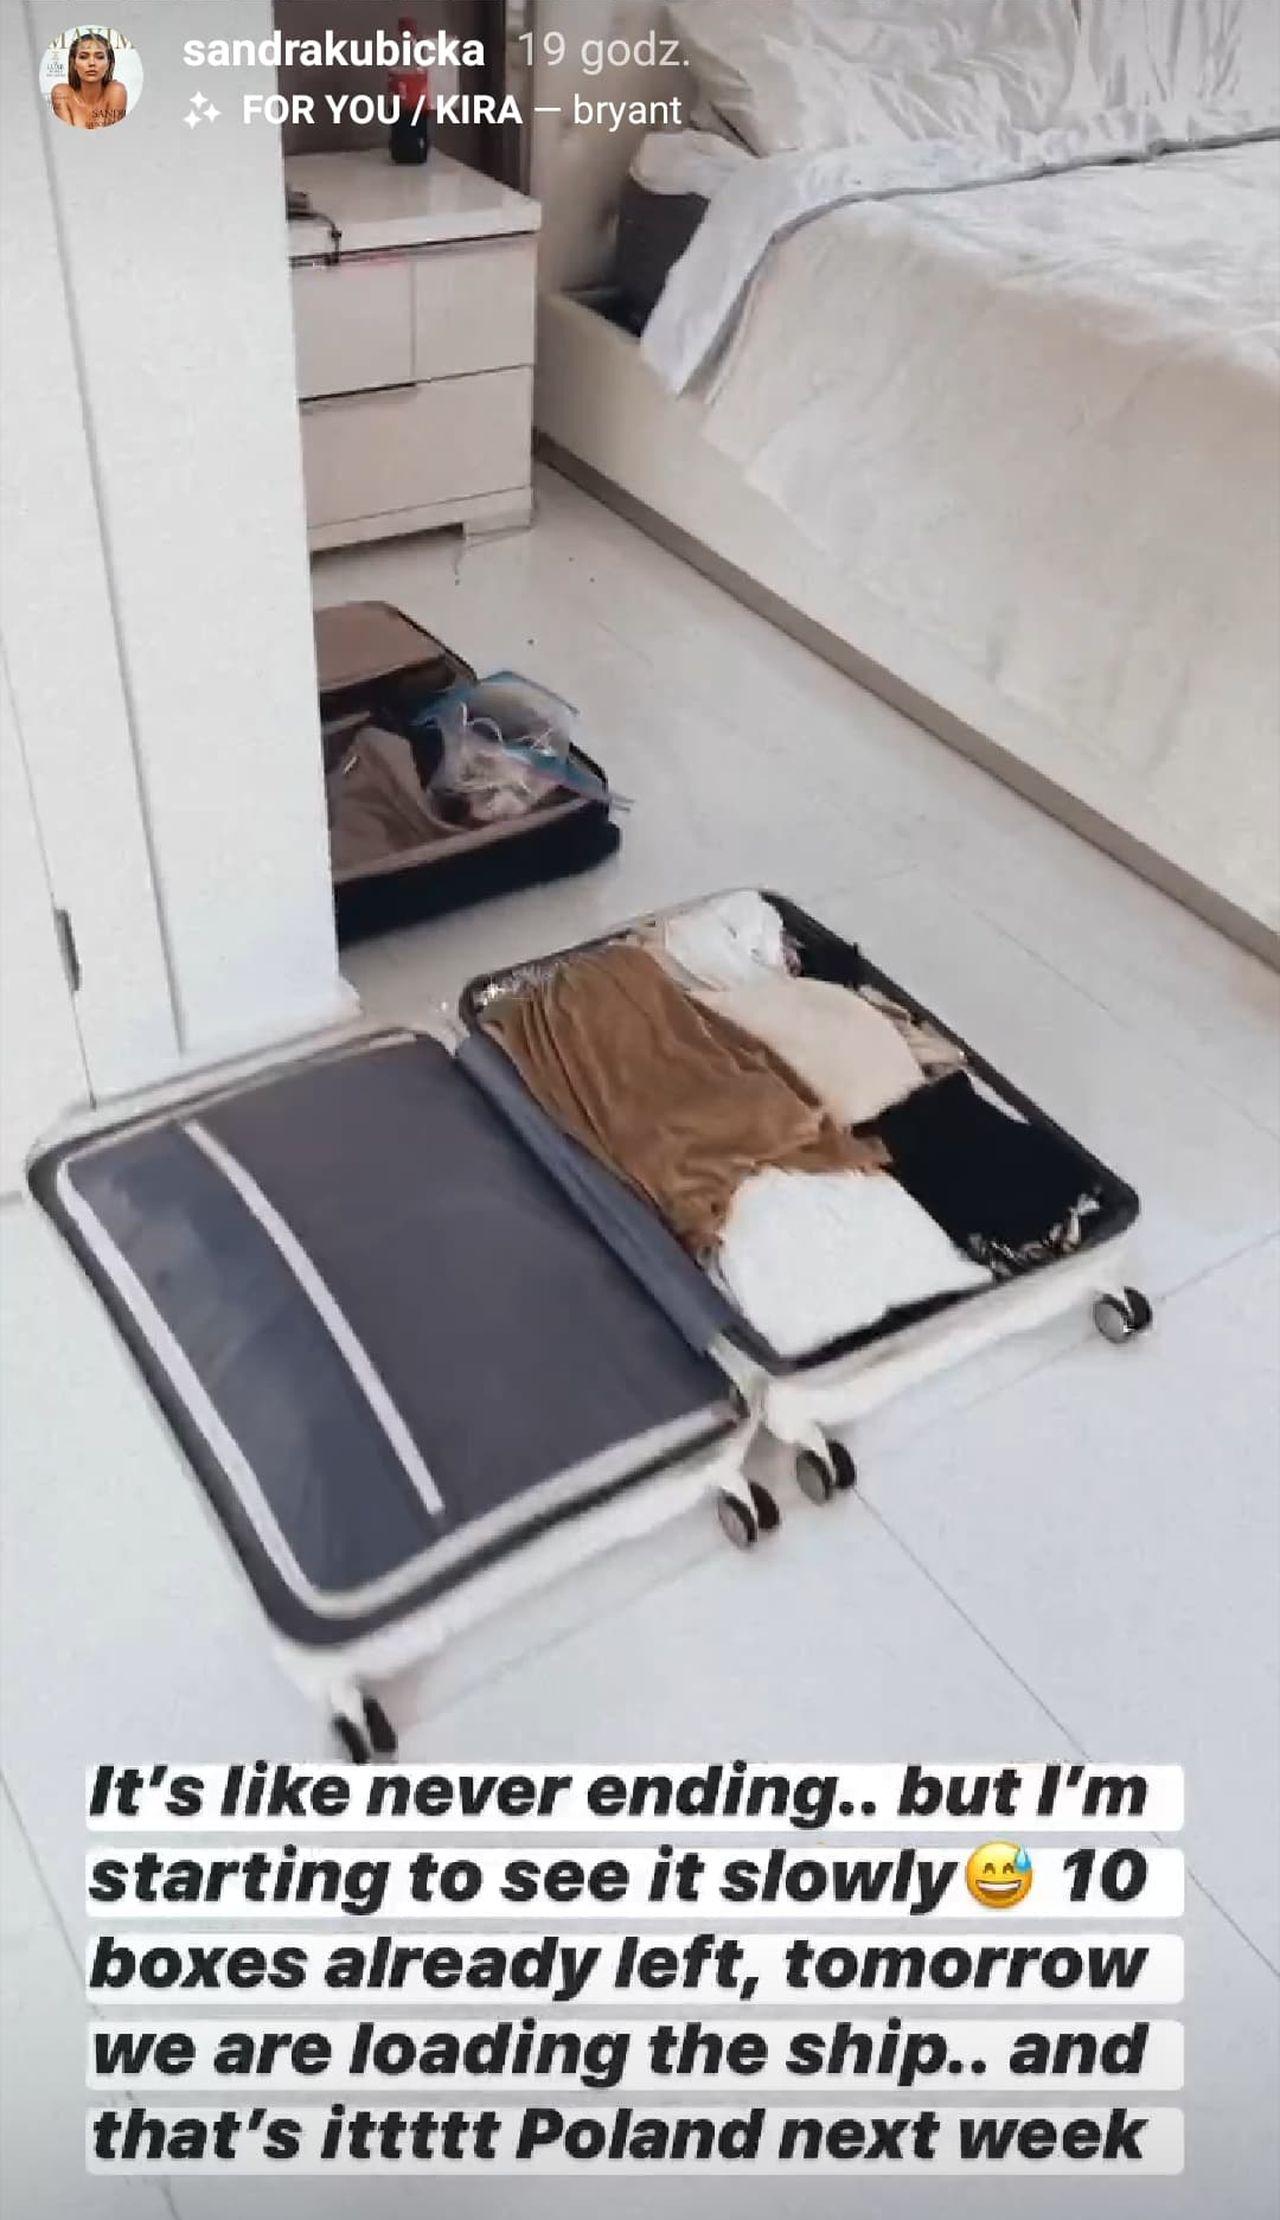 Sandra Kubicka pakuje się i wraca do Polski